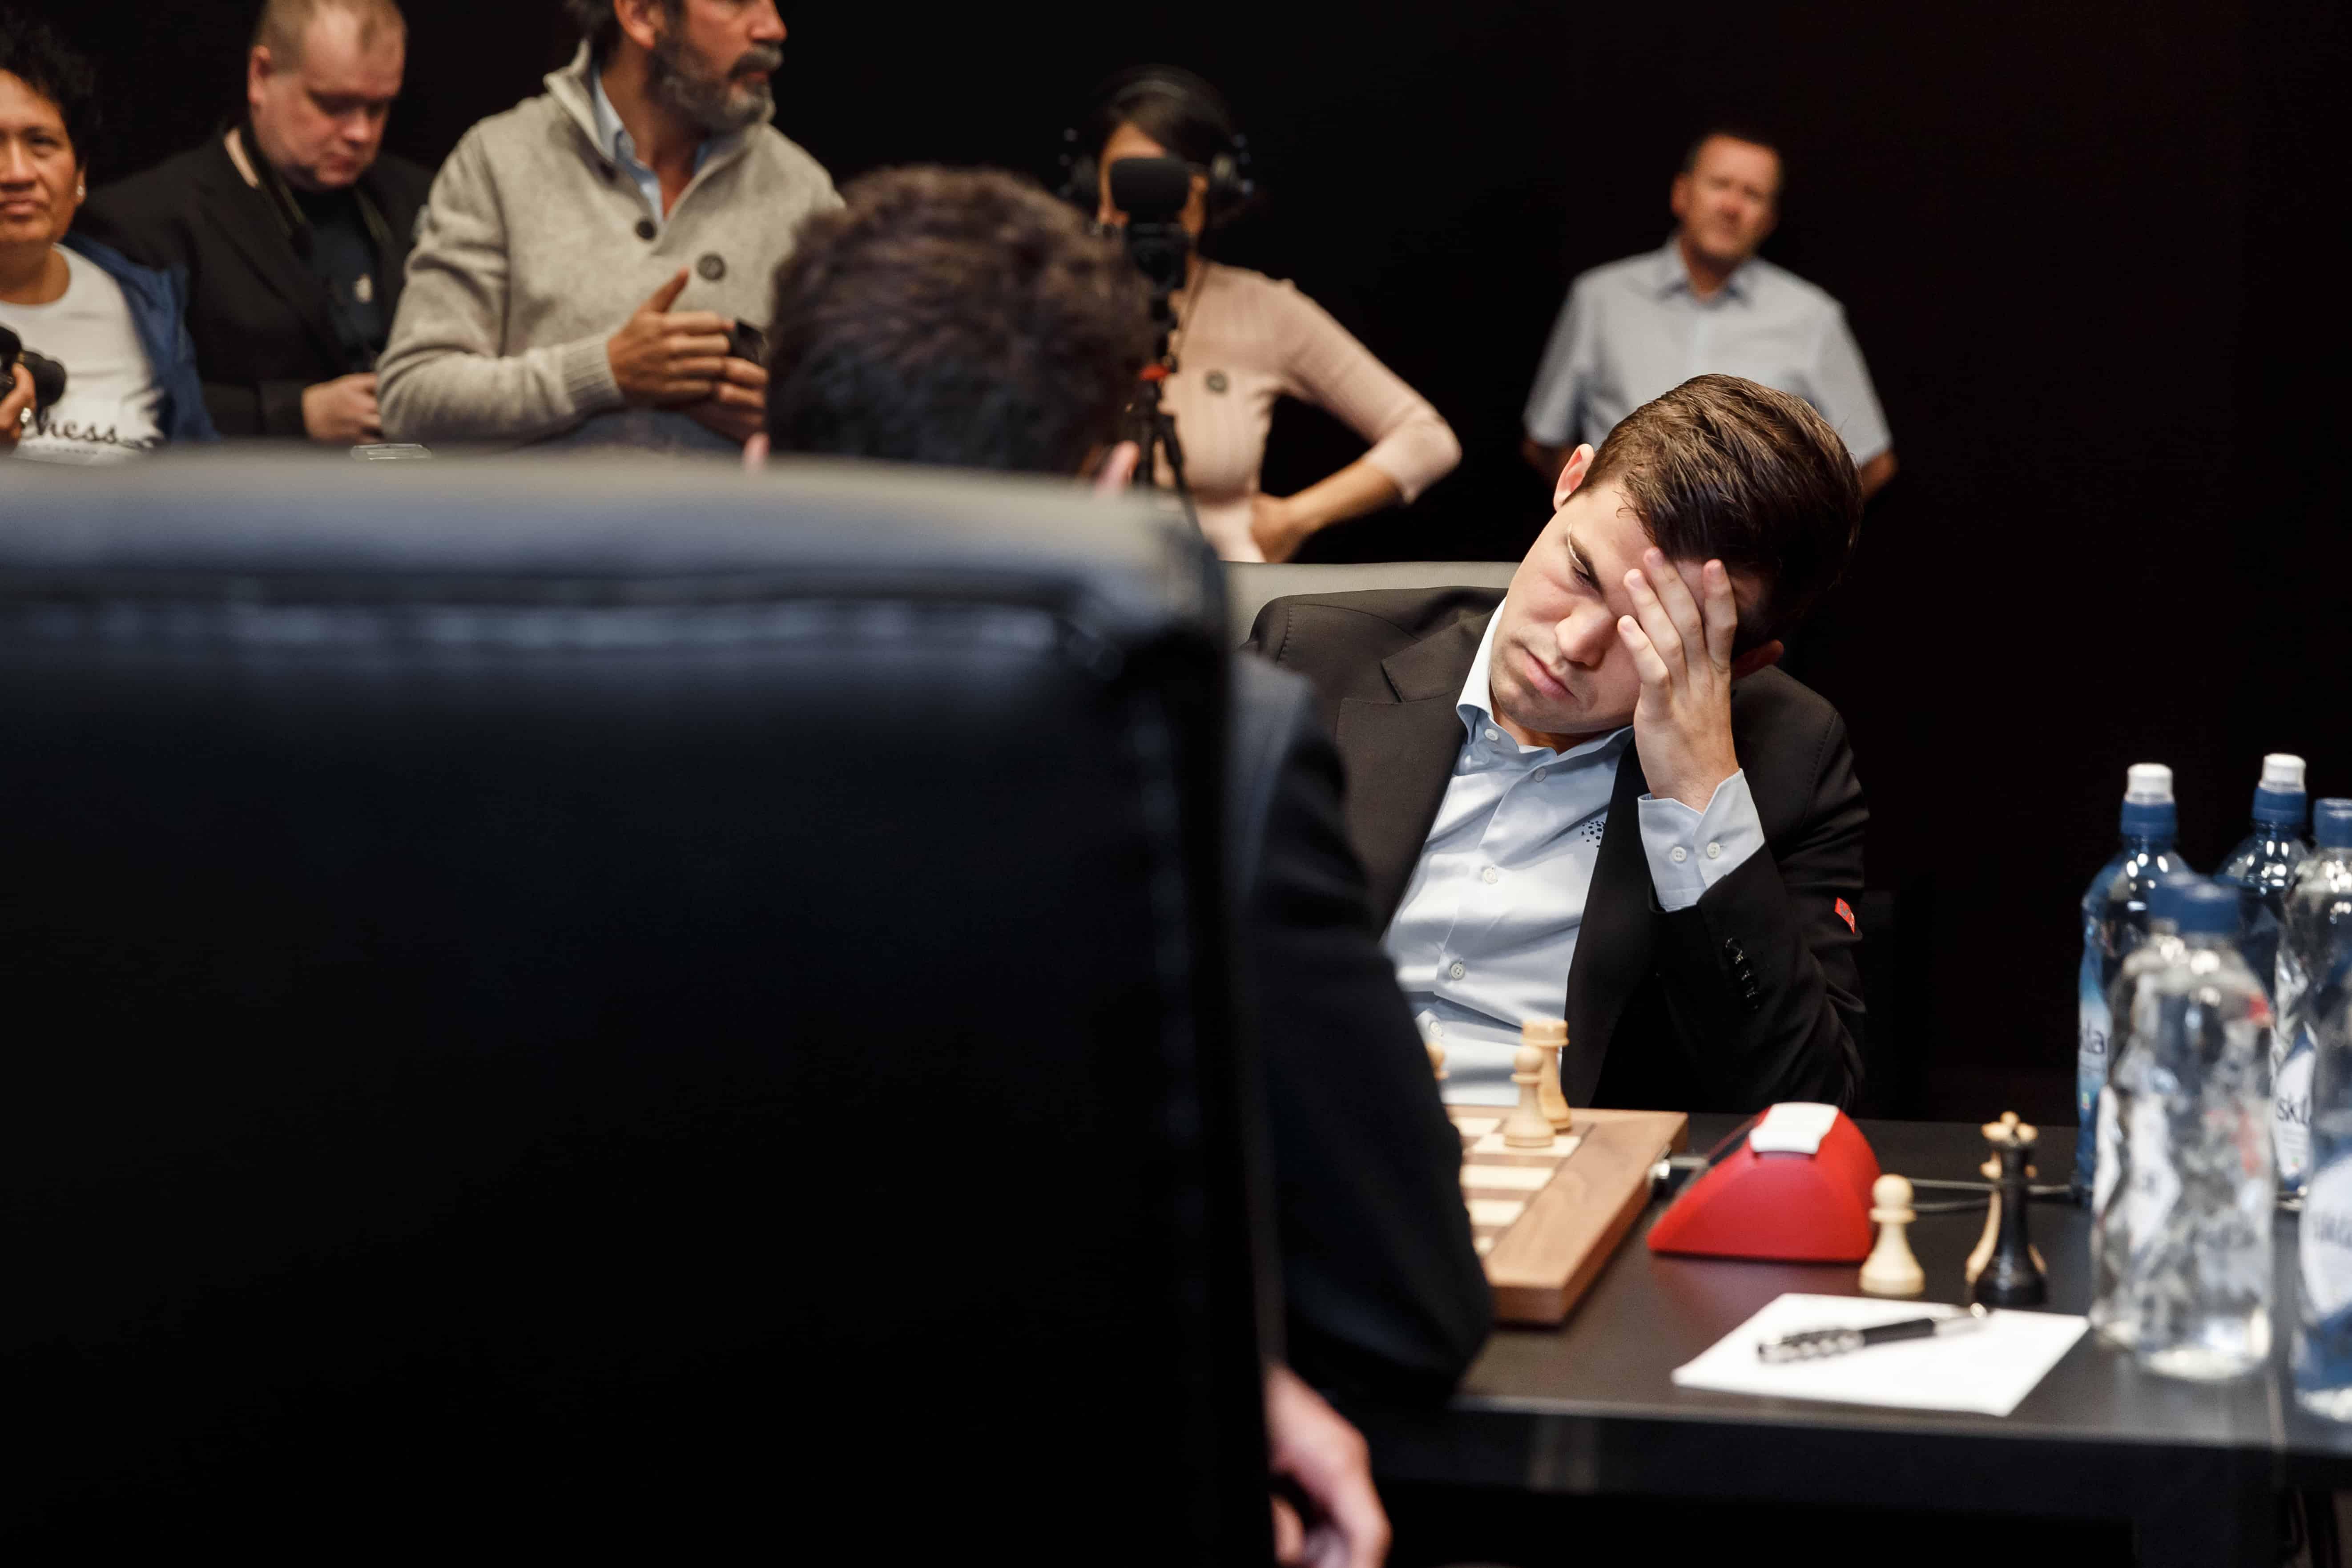 Magnus Carlsen had the white pieces